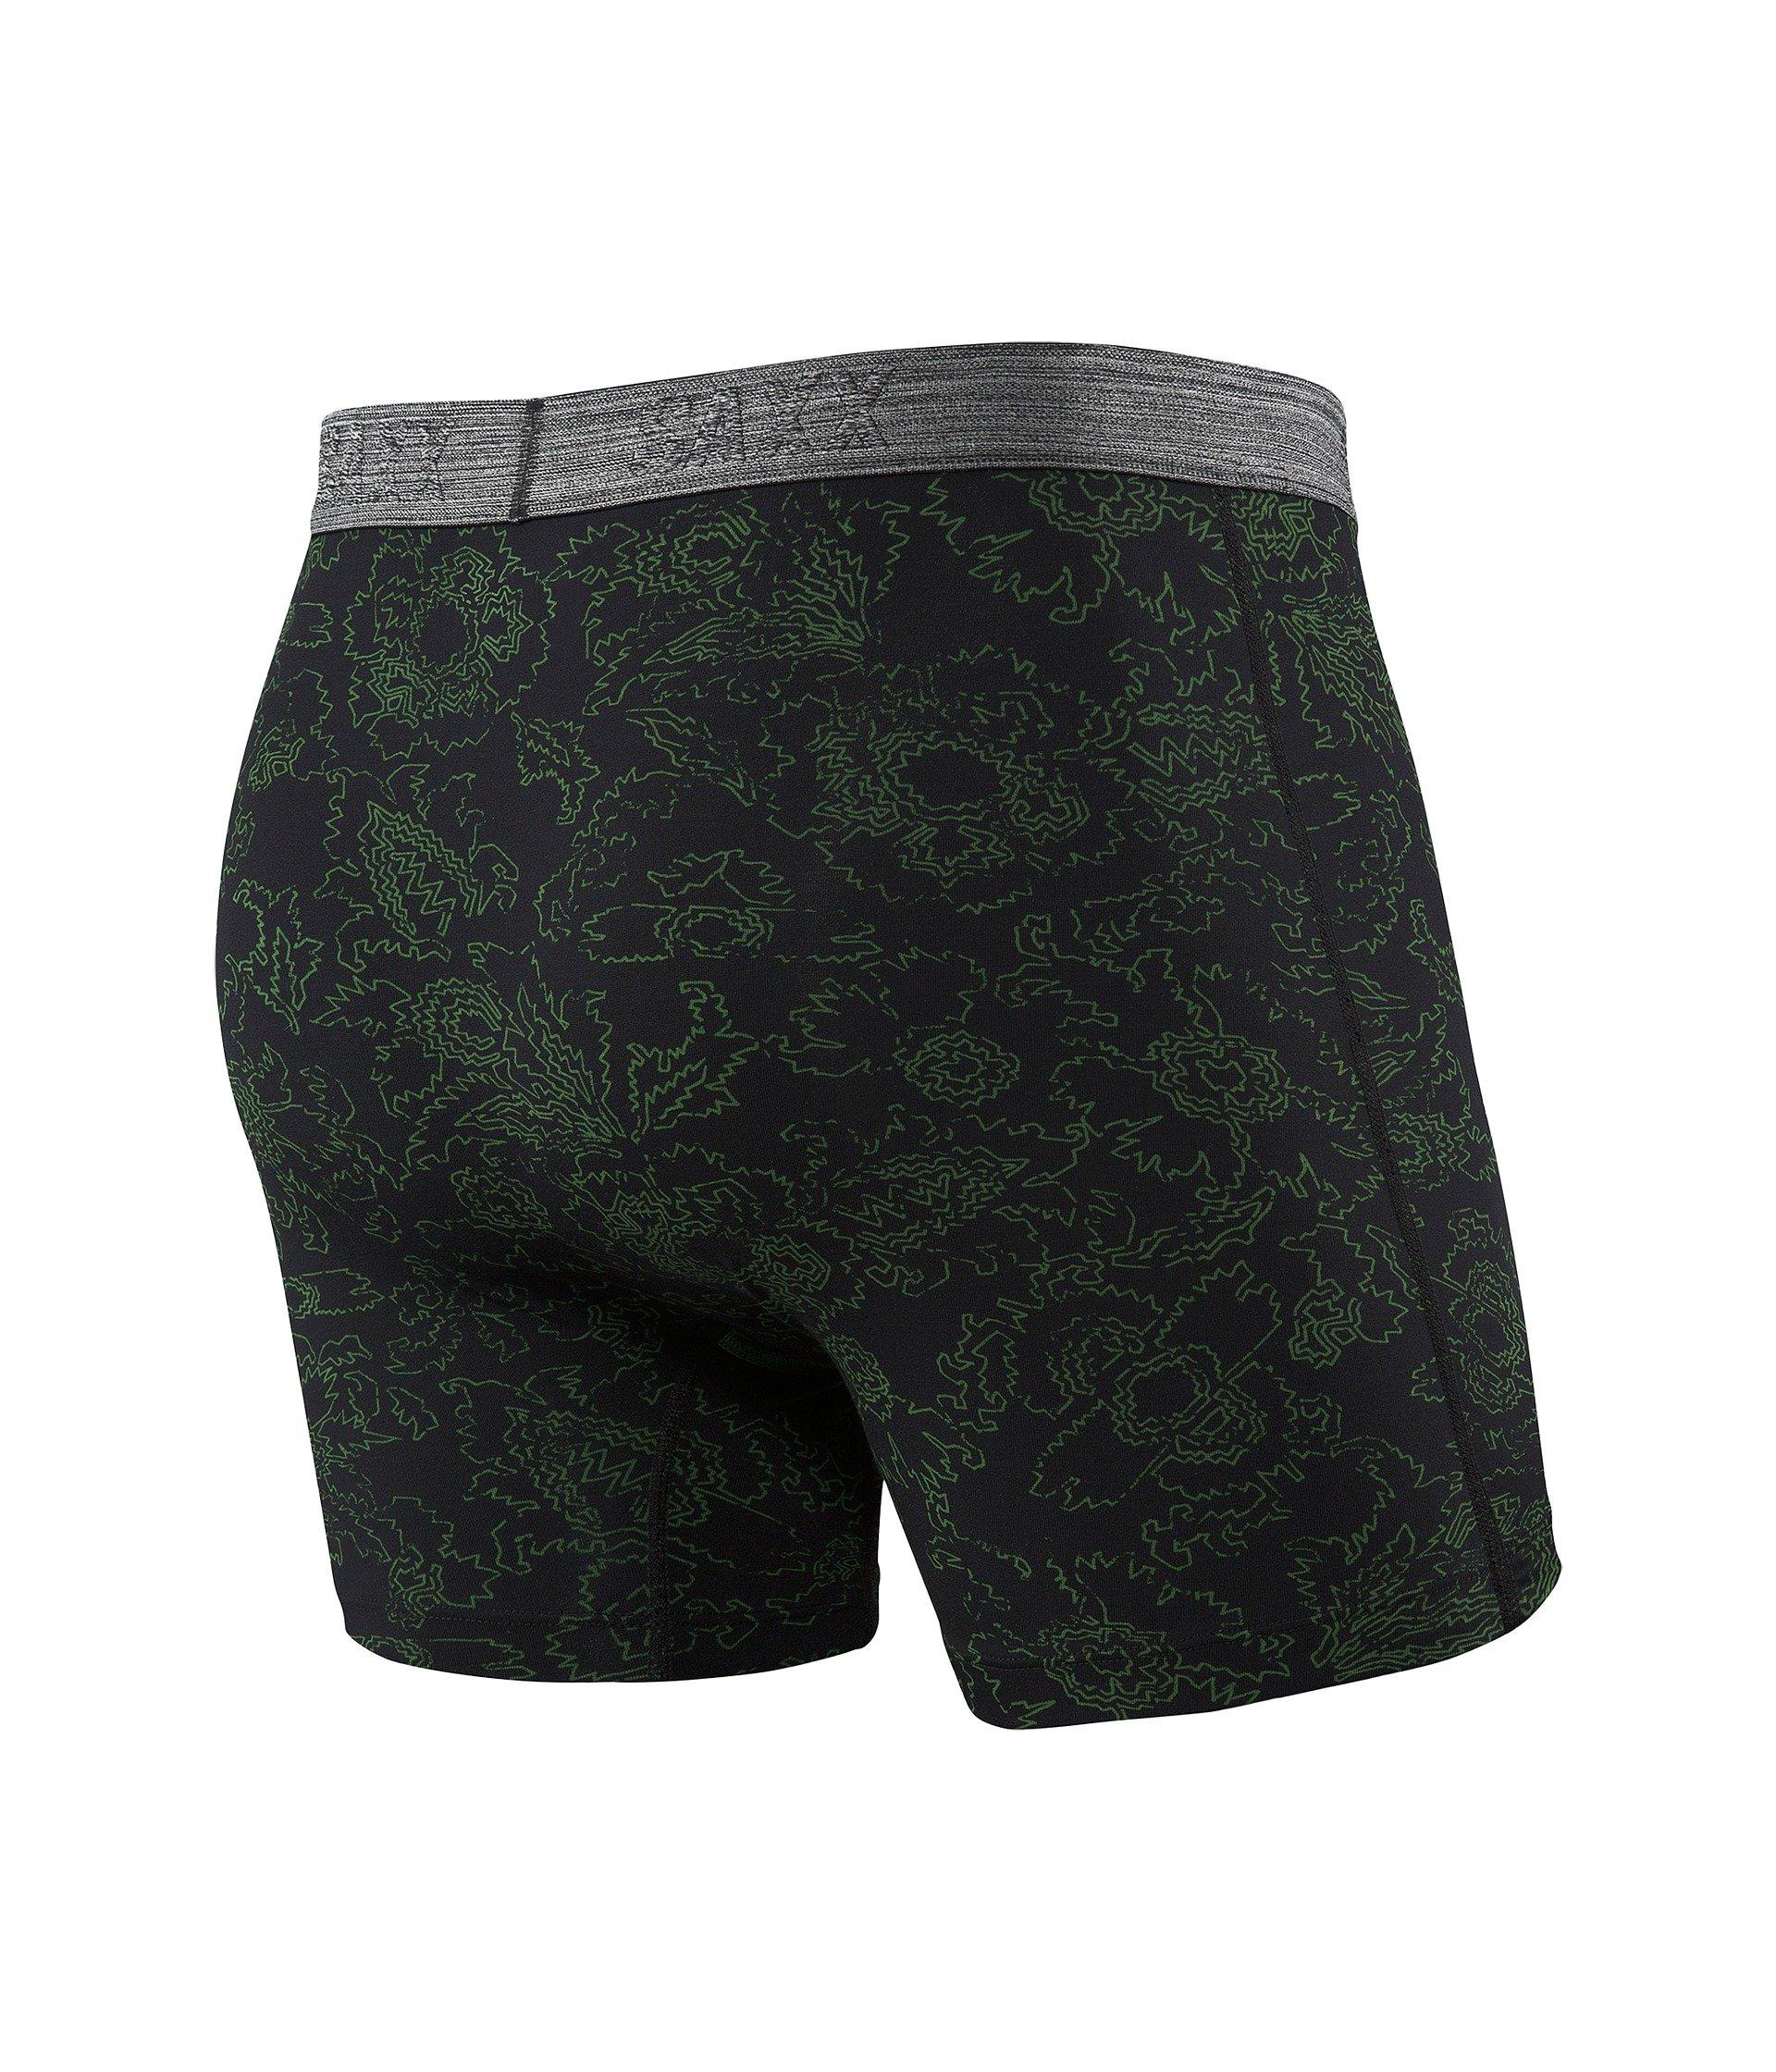 saxx underwear platinum boxer fly at. Black Bedroom Furniture Sets. Home Design Ideas